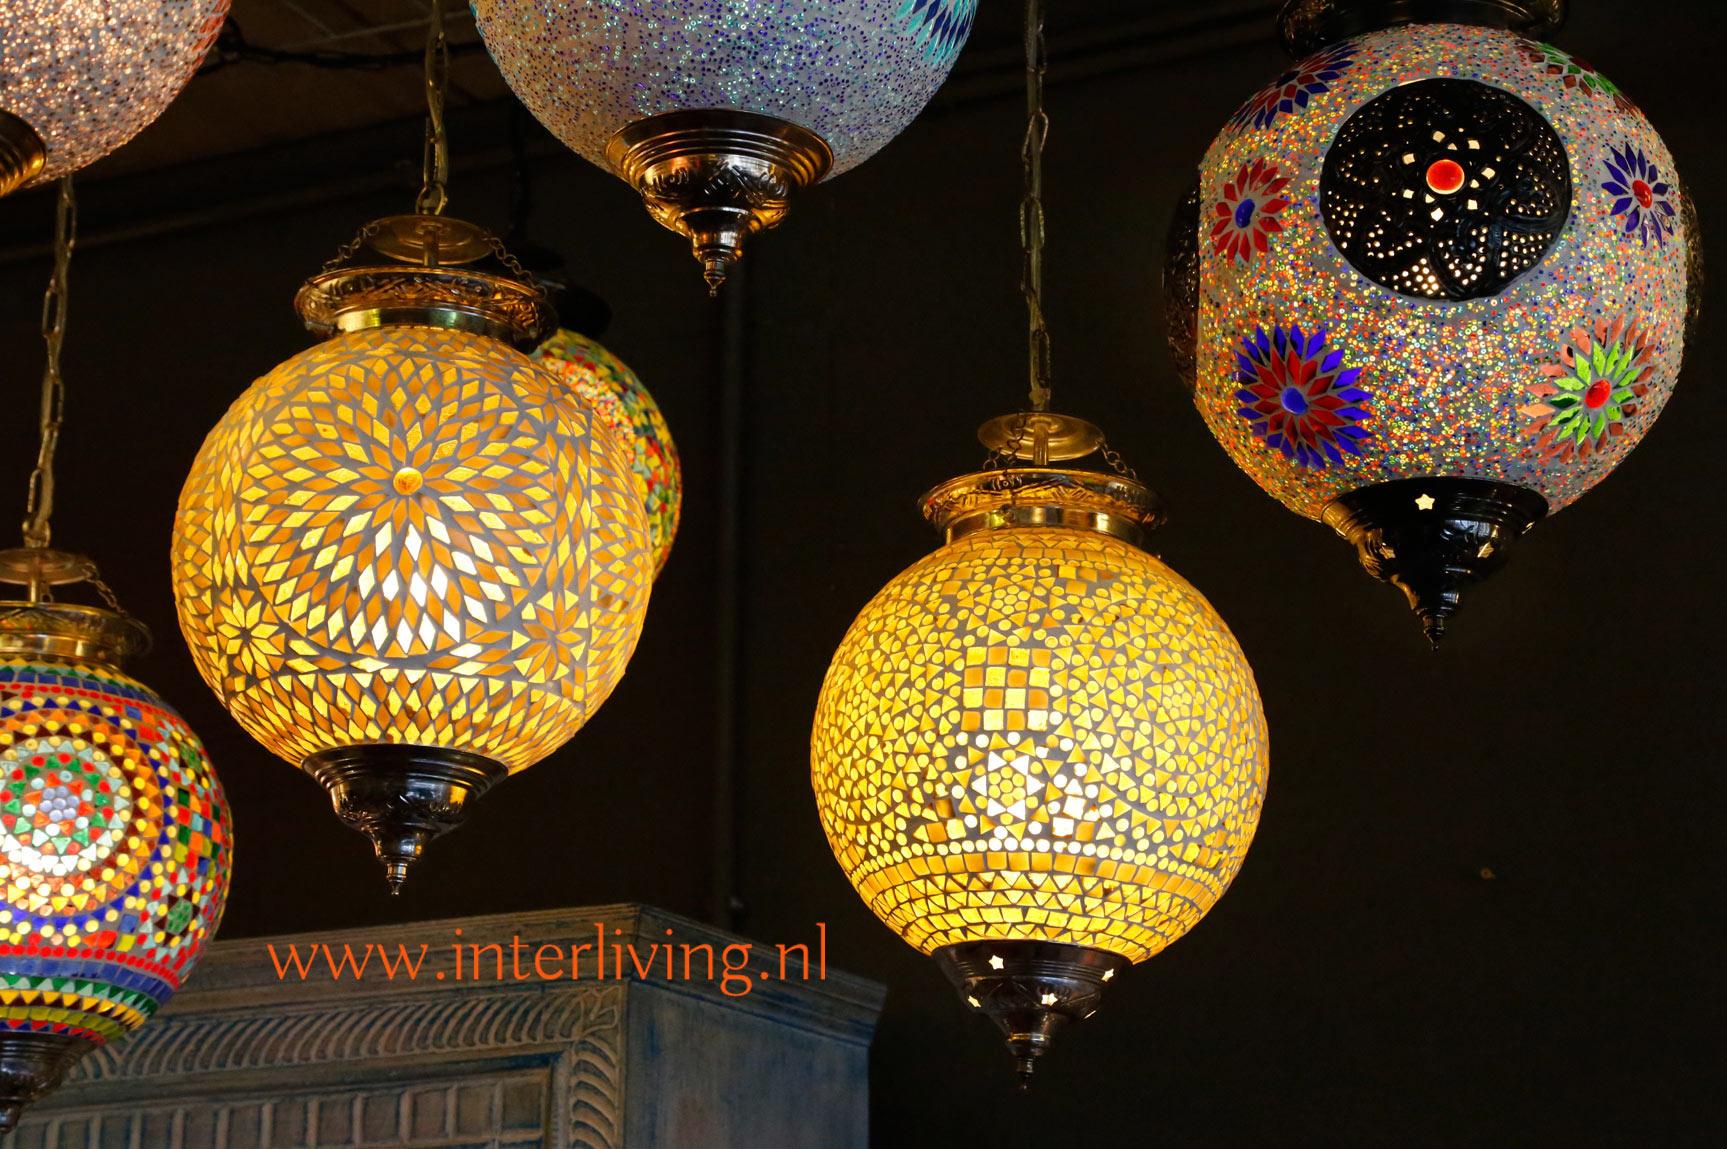 Lampen Oosterse Stijl : Oosterse lampen en mozaïekverlichting glasmozaïek en gaatjeslampen